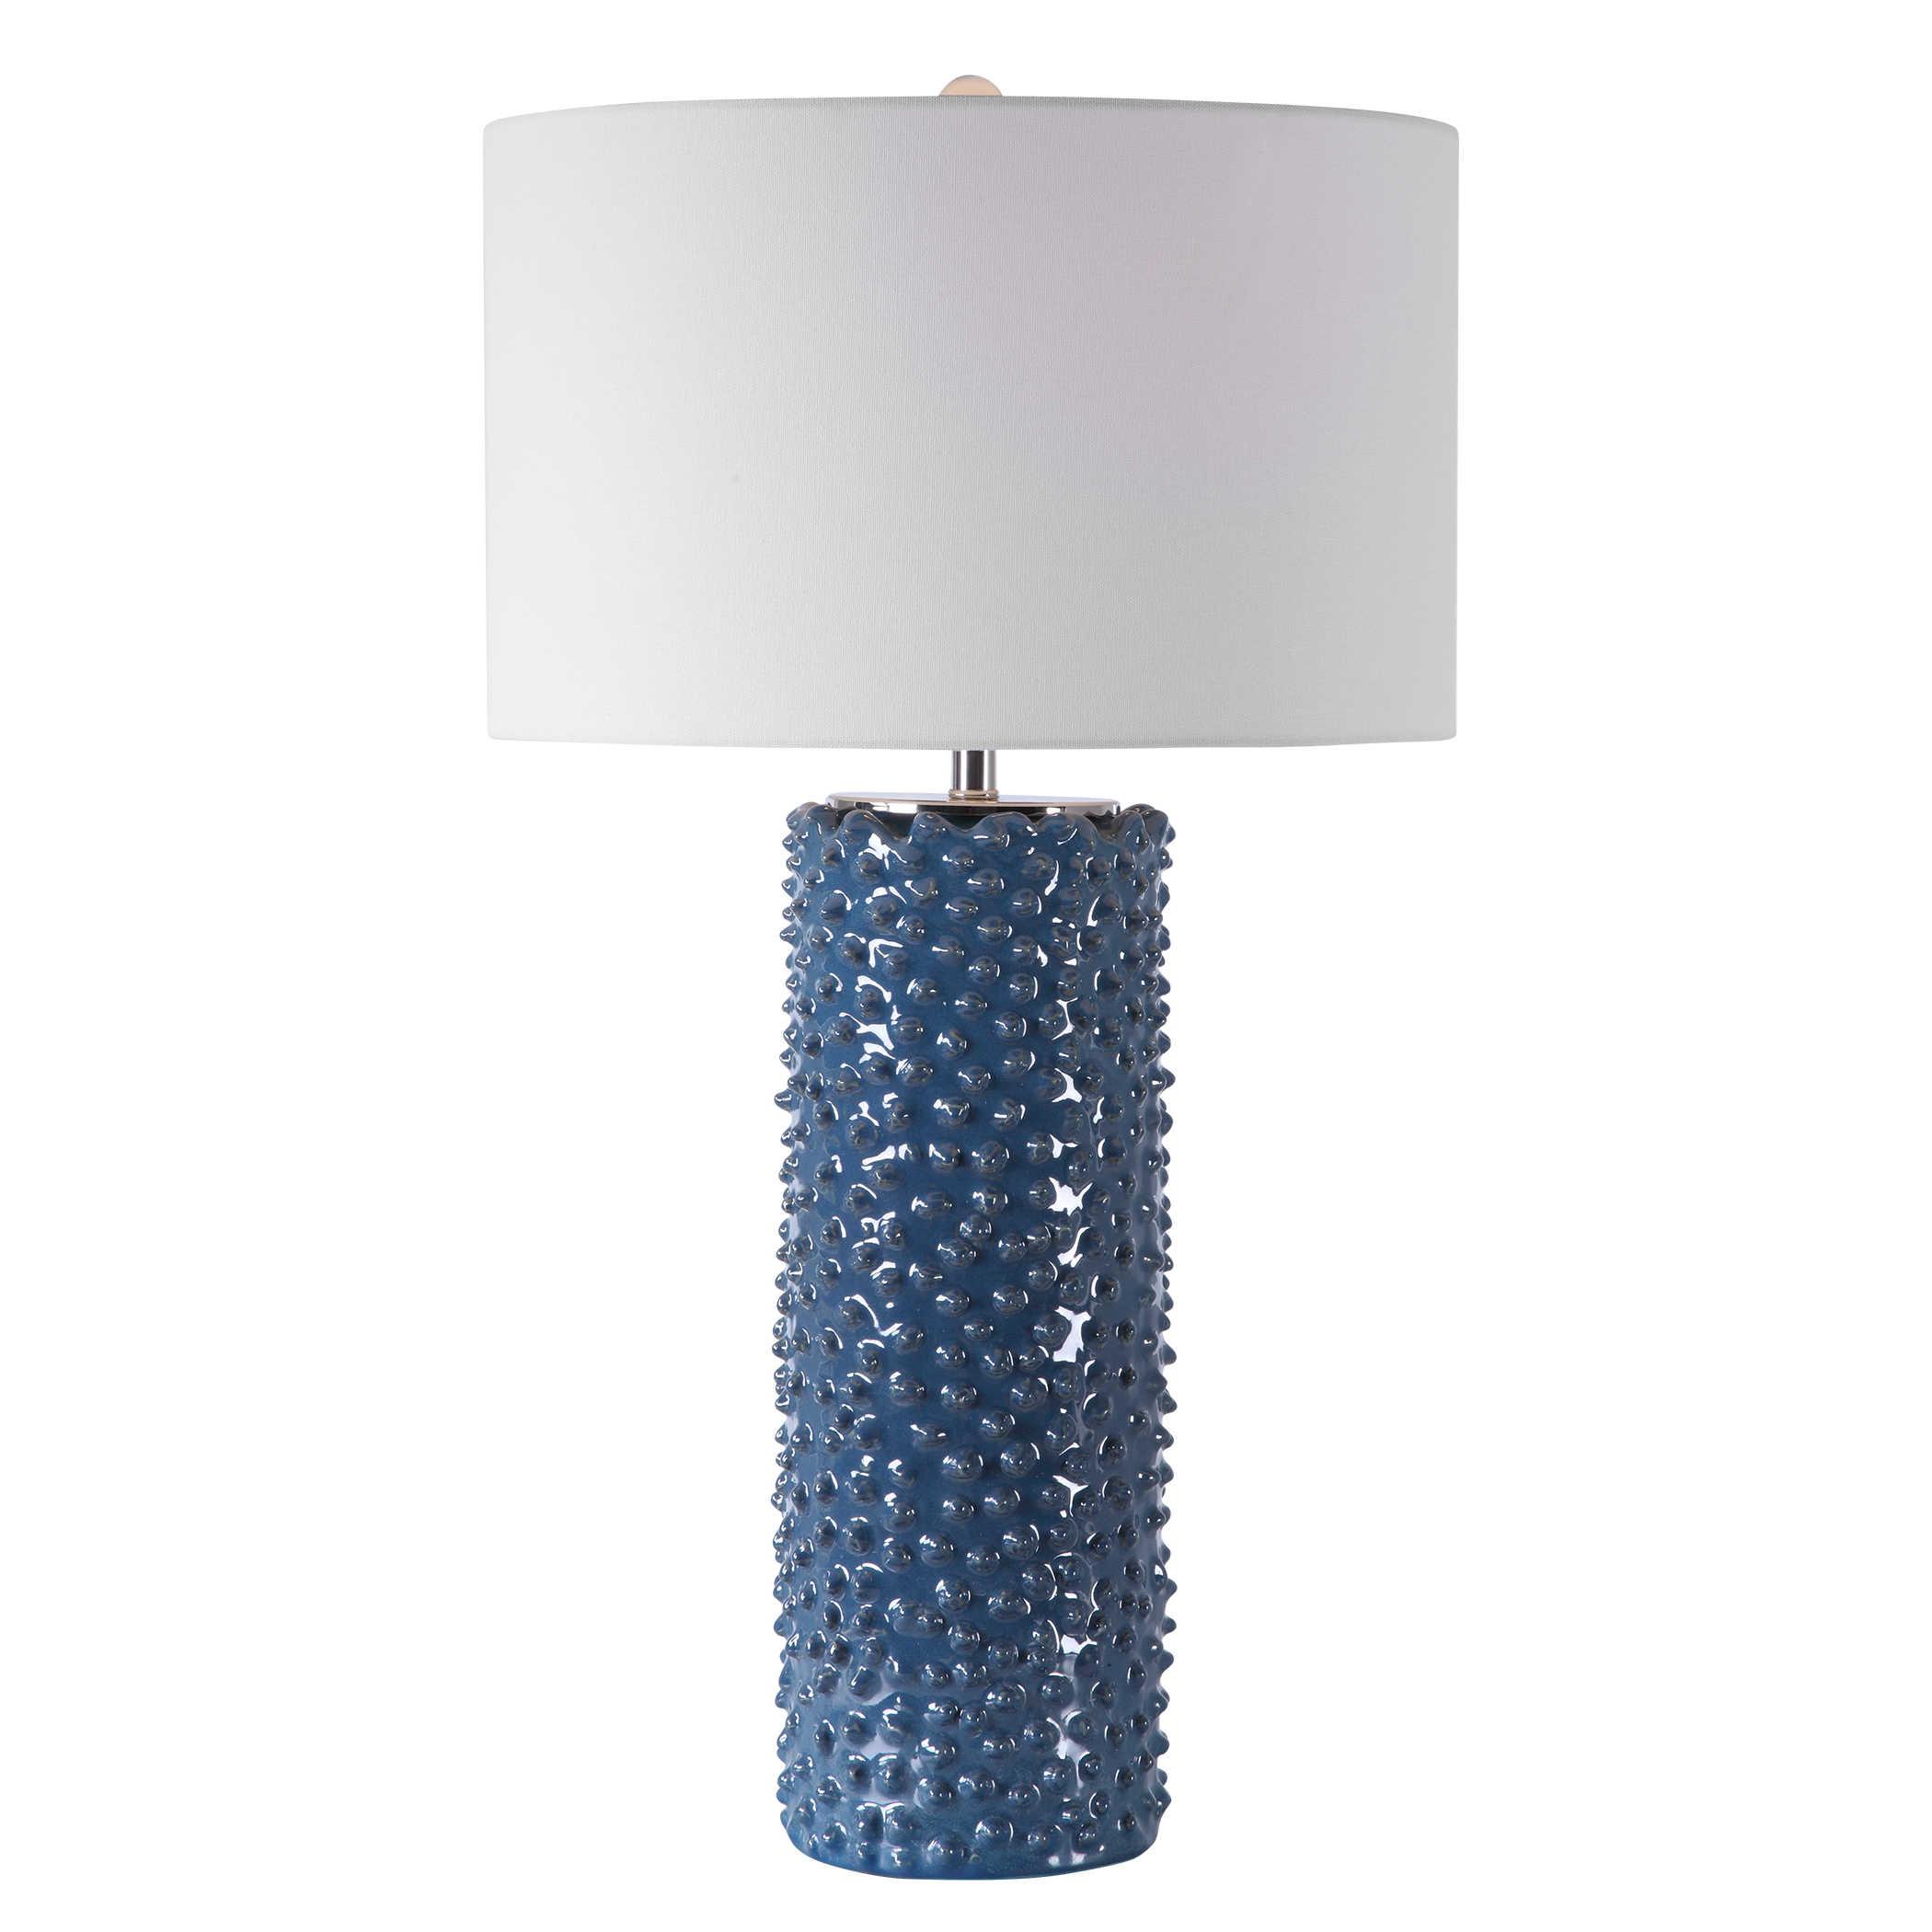 Indigo Table Lamp-$445.00